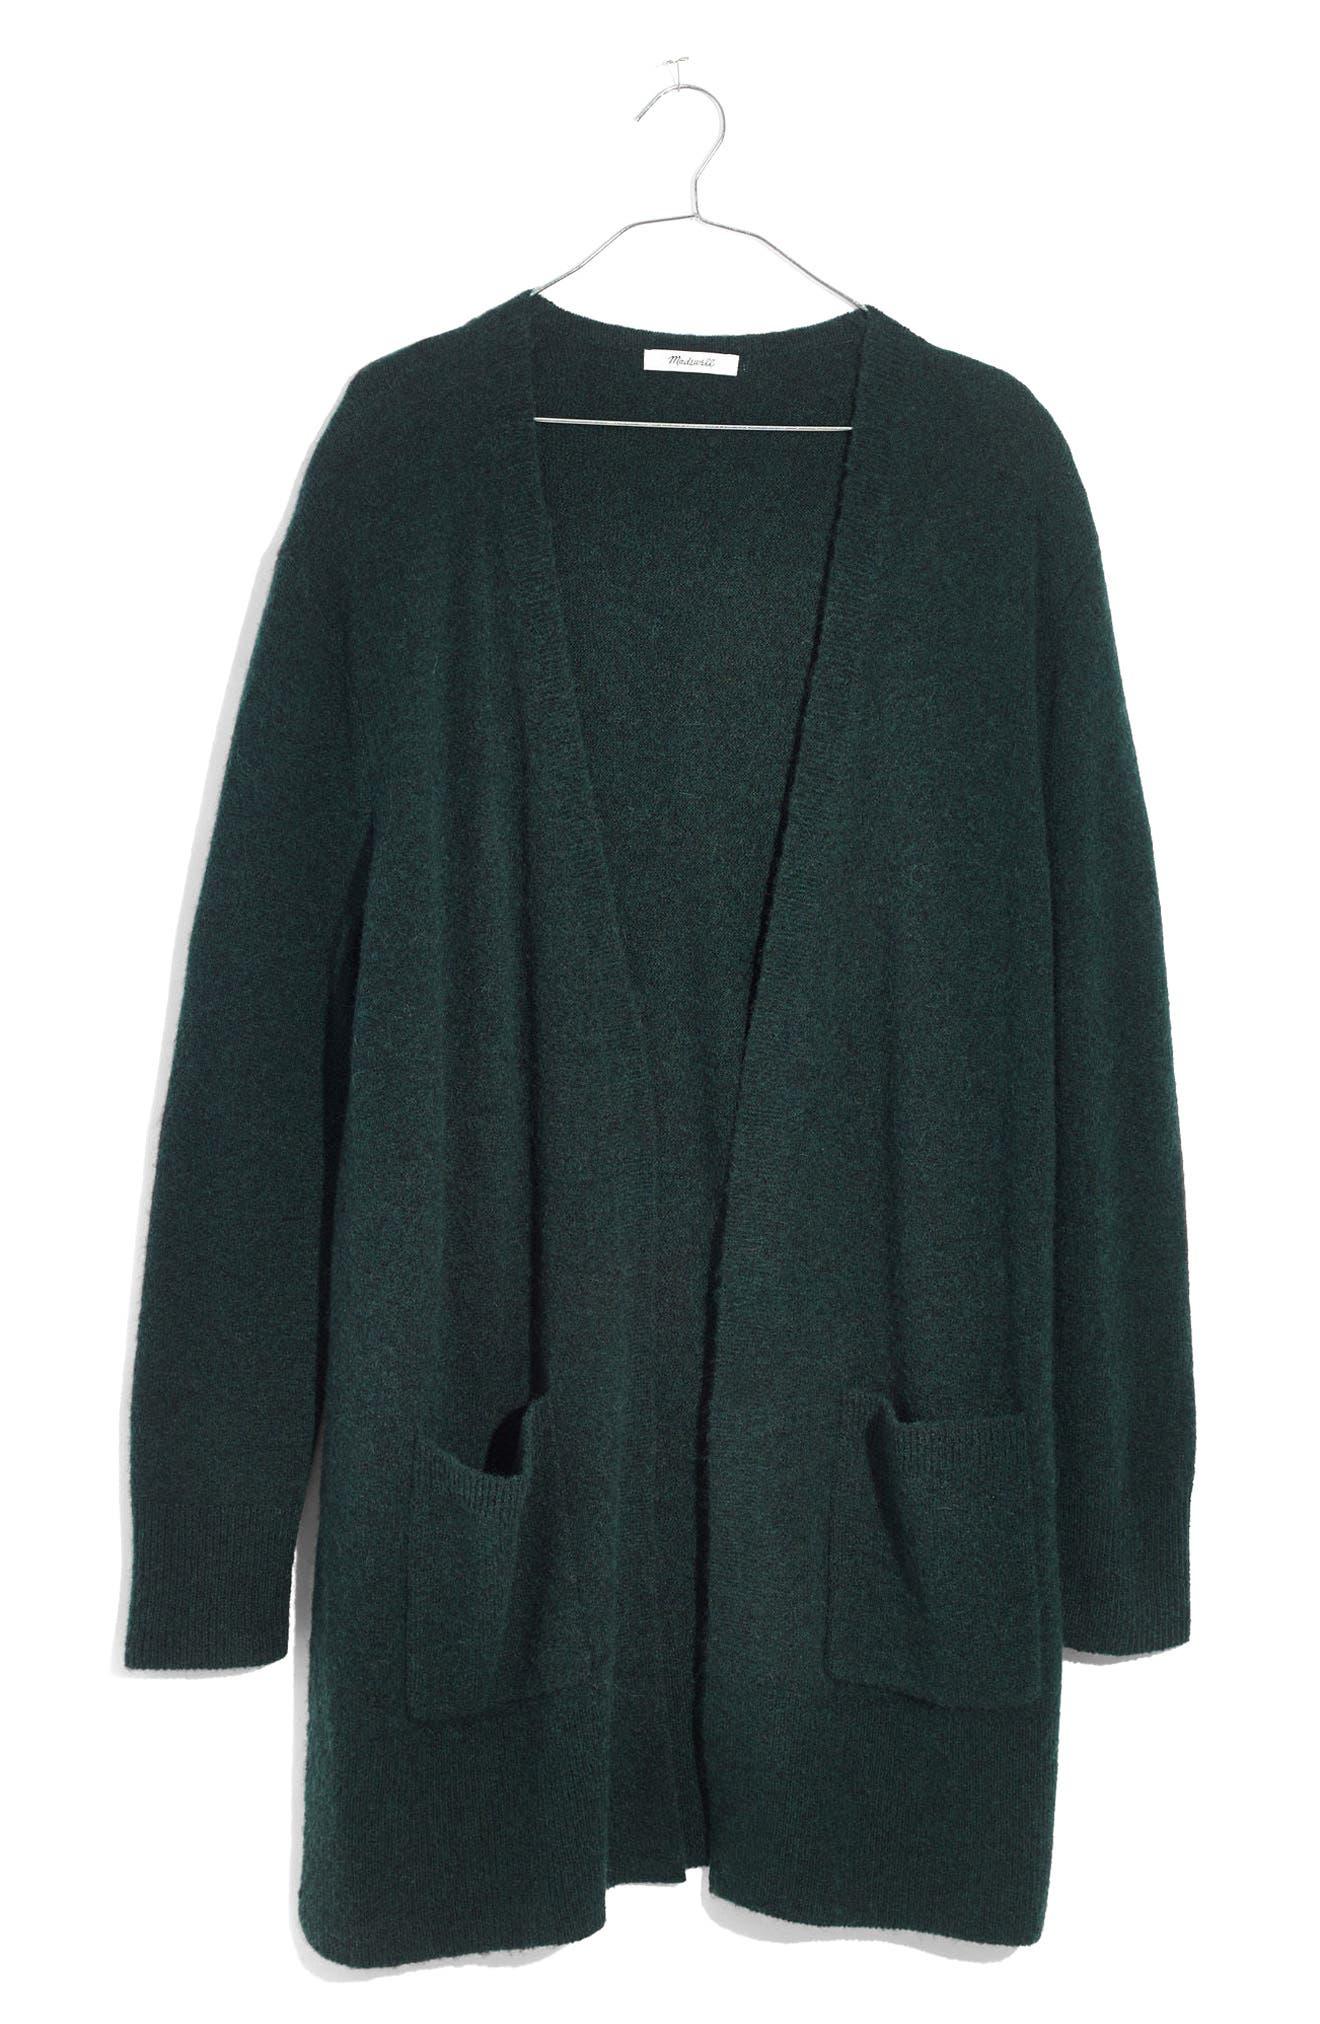 Kent Cardigan Sweater,                             Alternate thumbnail 44, color,